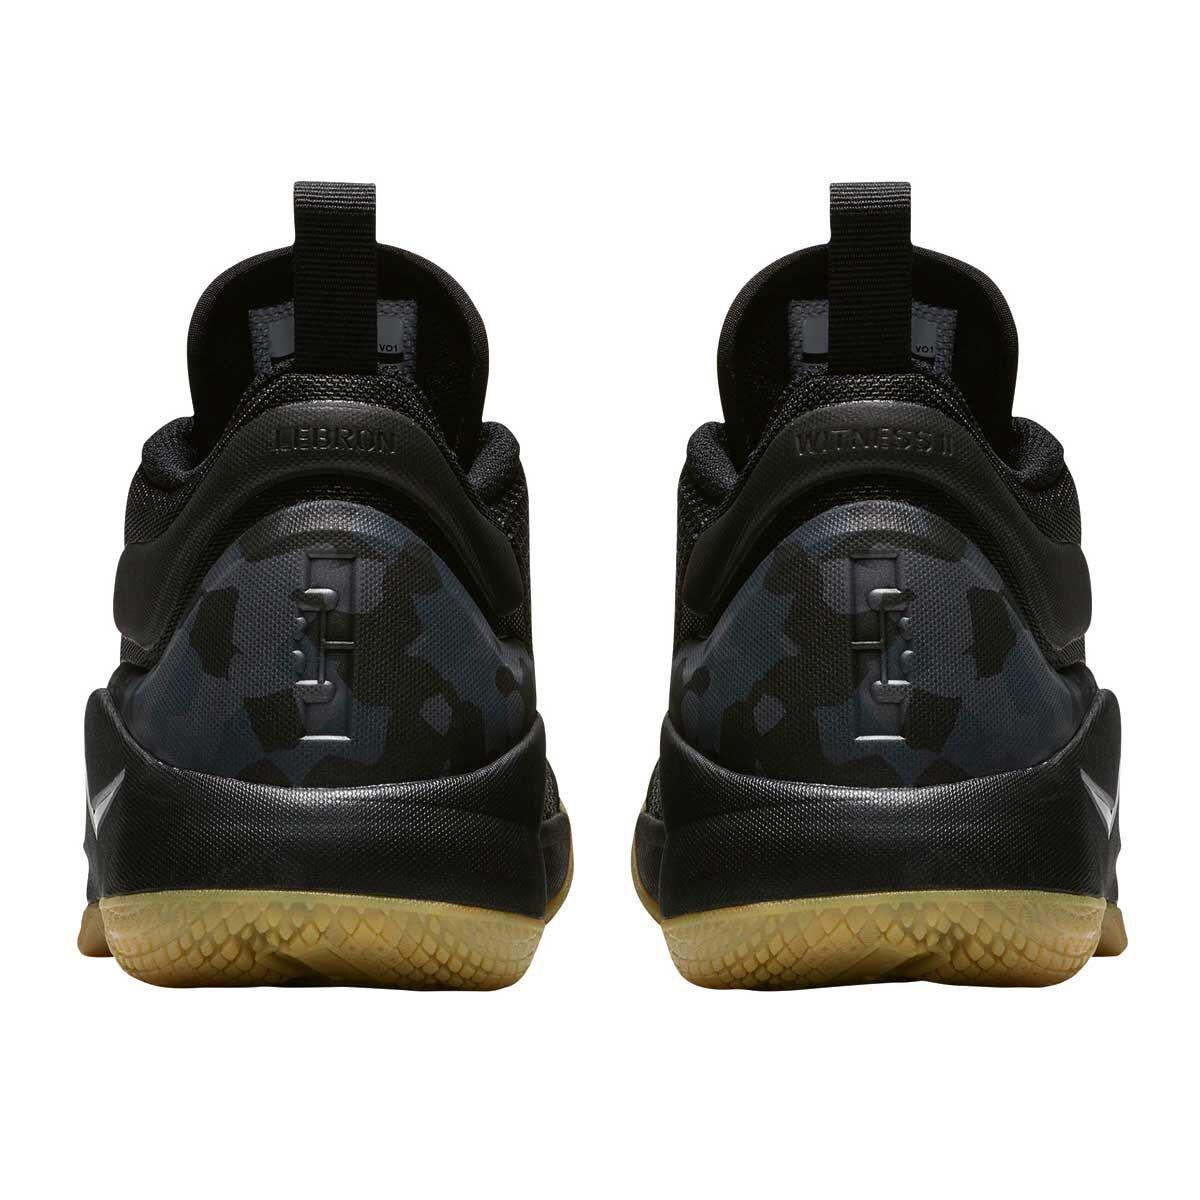 fedafd683611b ... shop nike lebron witness ii boys basketball shoes black brown us 4  black brown 725c5 1b34d ...